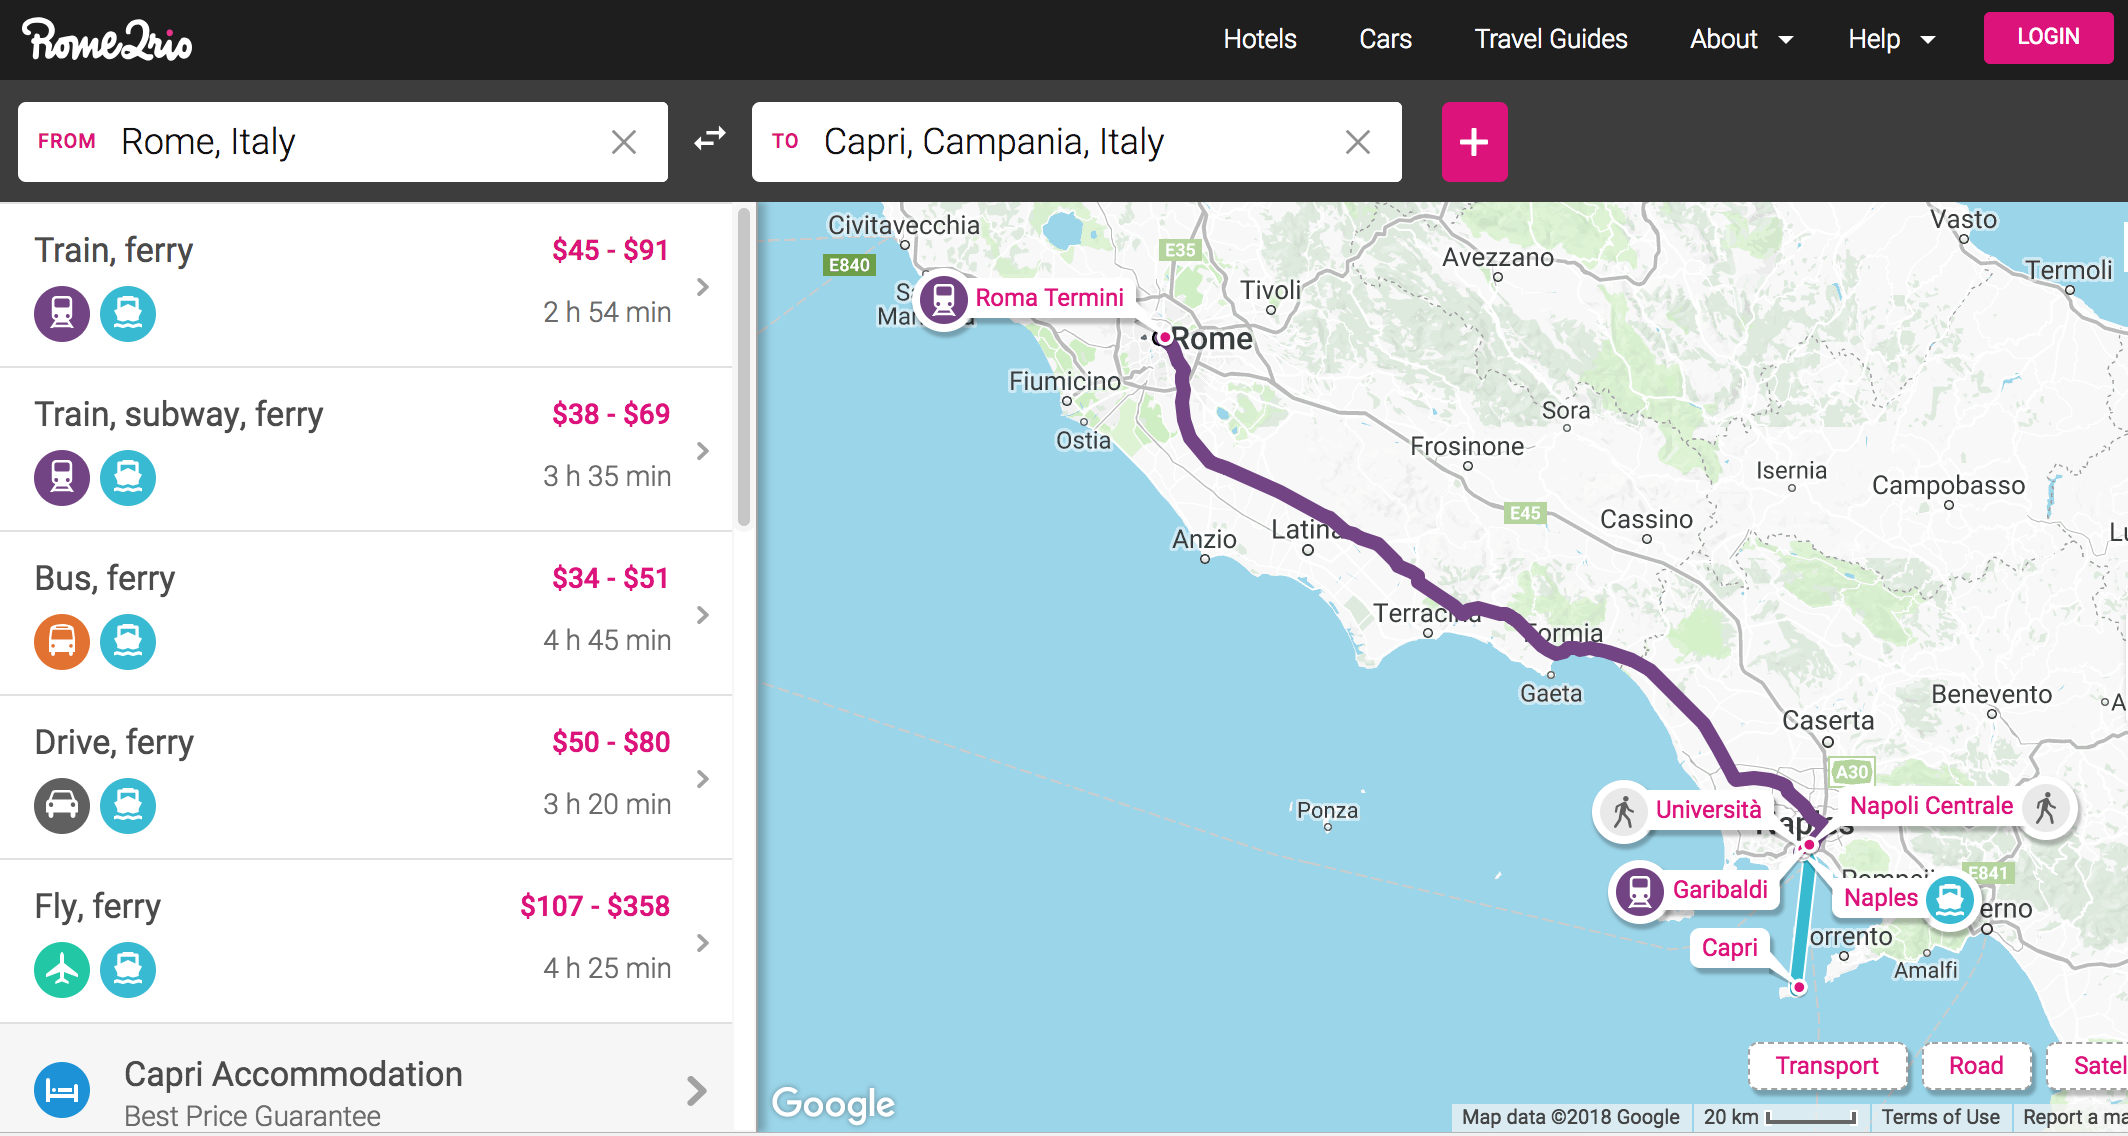 Rome2Rio_Rome to Capri example.png